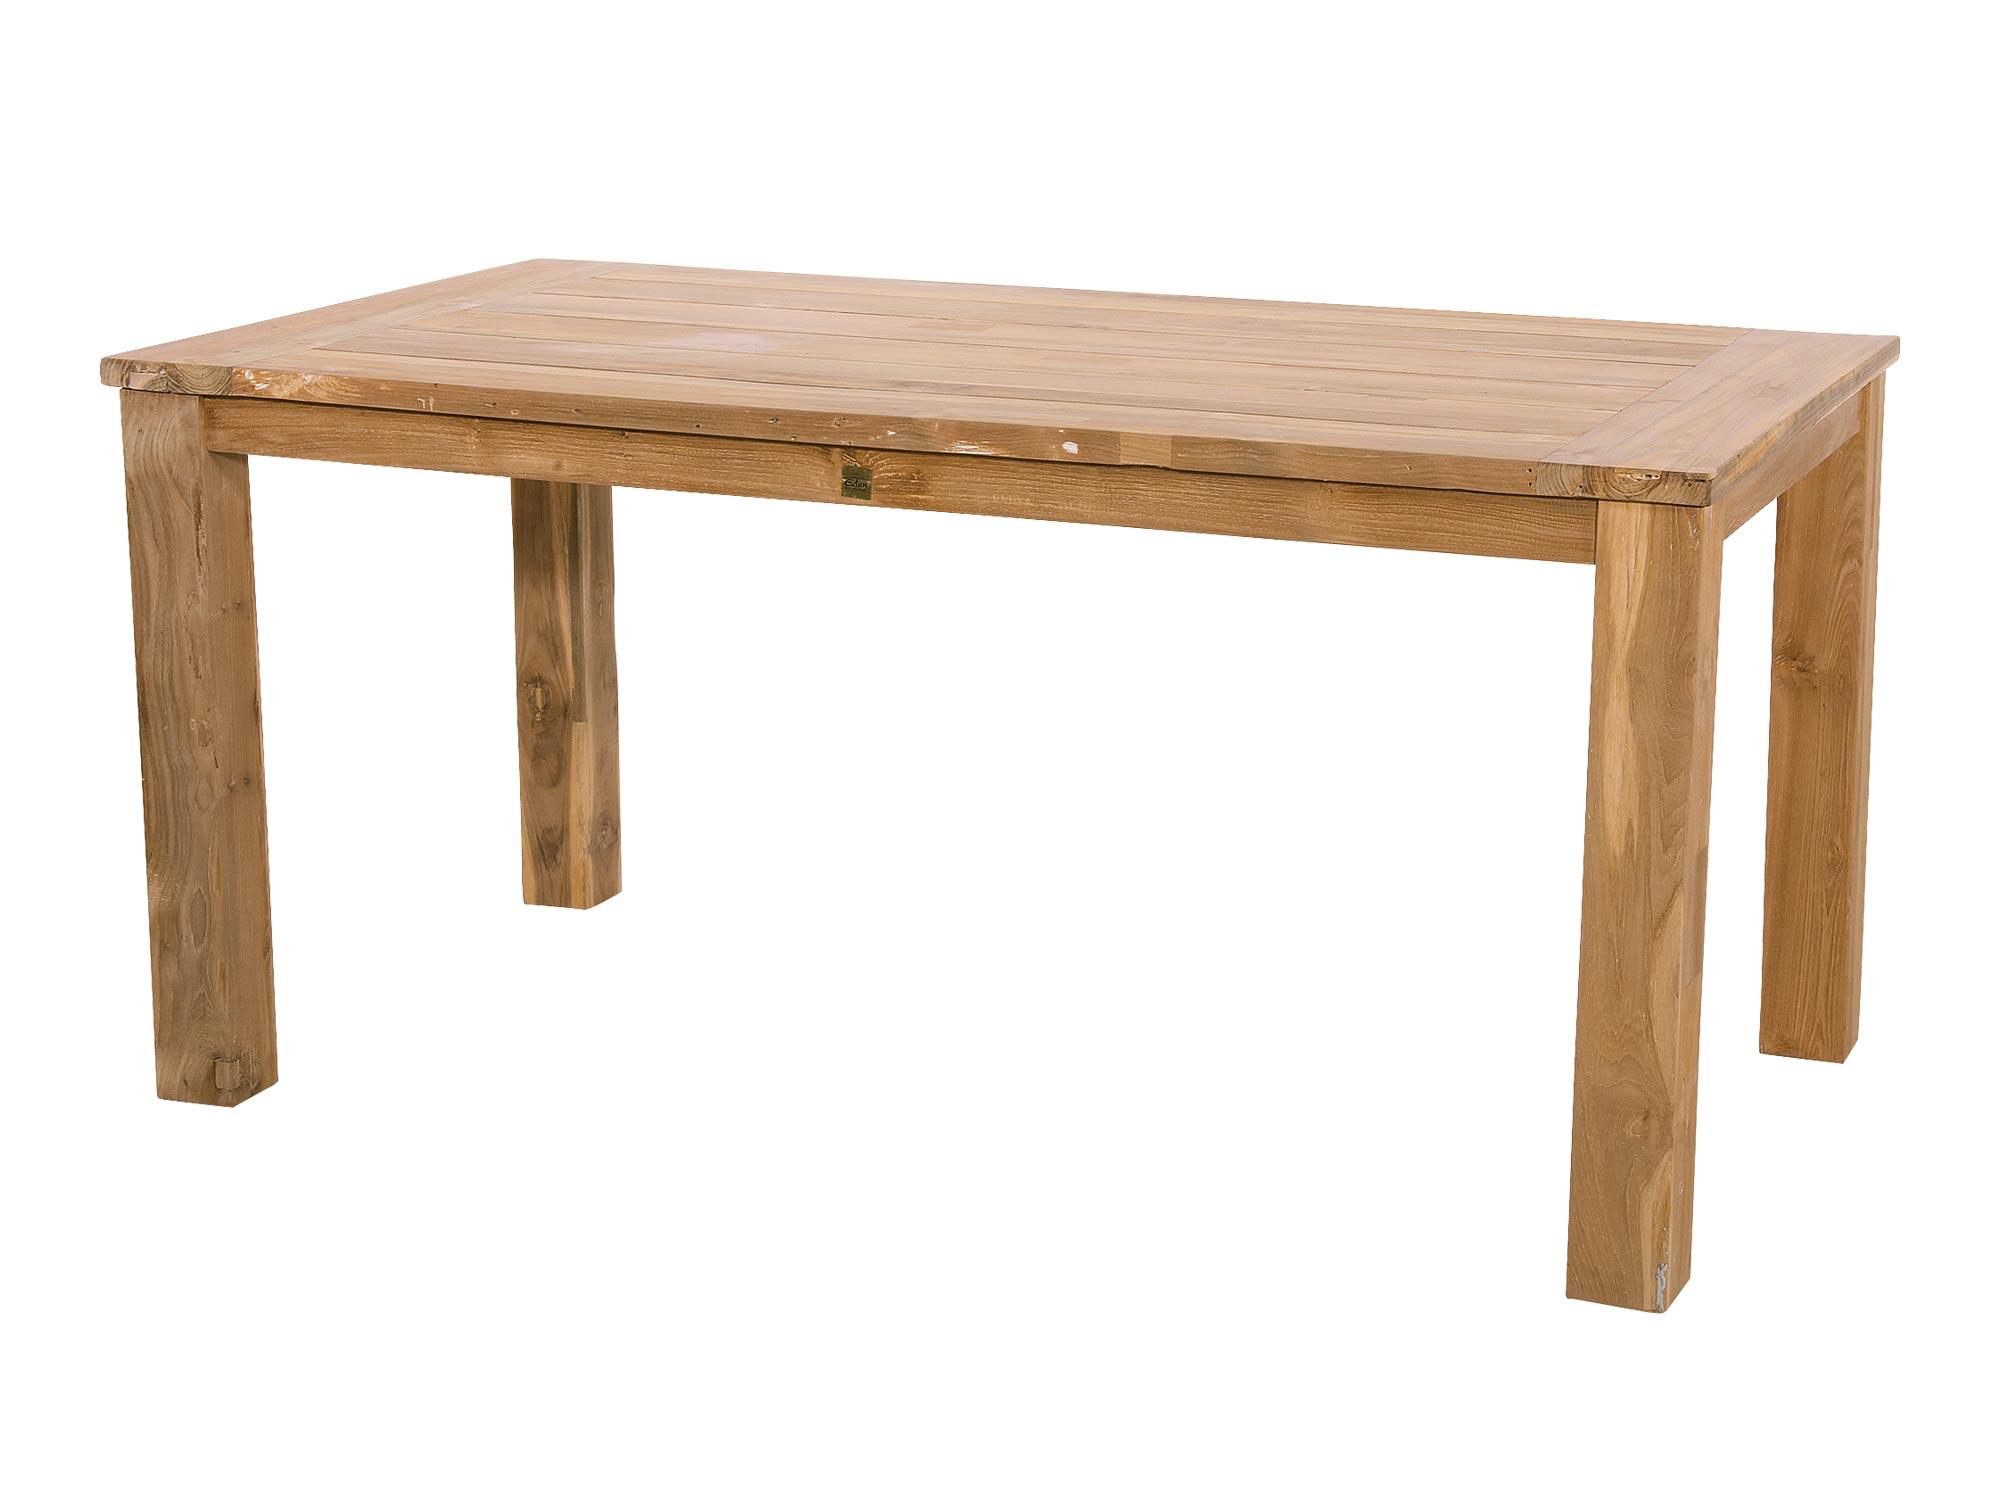 Lifestyle4Living Gartentisch aus recyceltem Teakholz, Maße: B/H/T ca. 240/76/100 cm